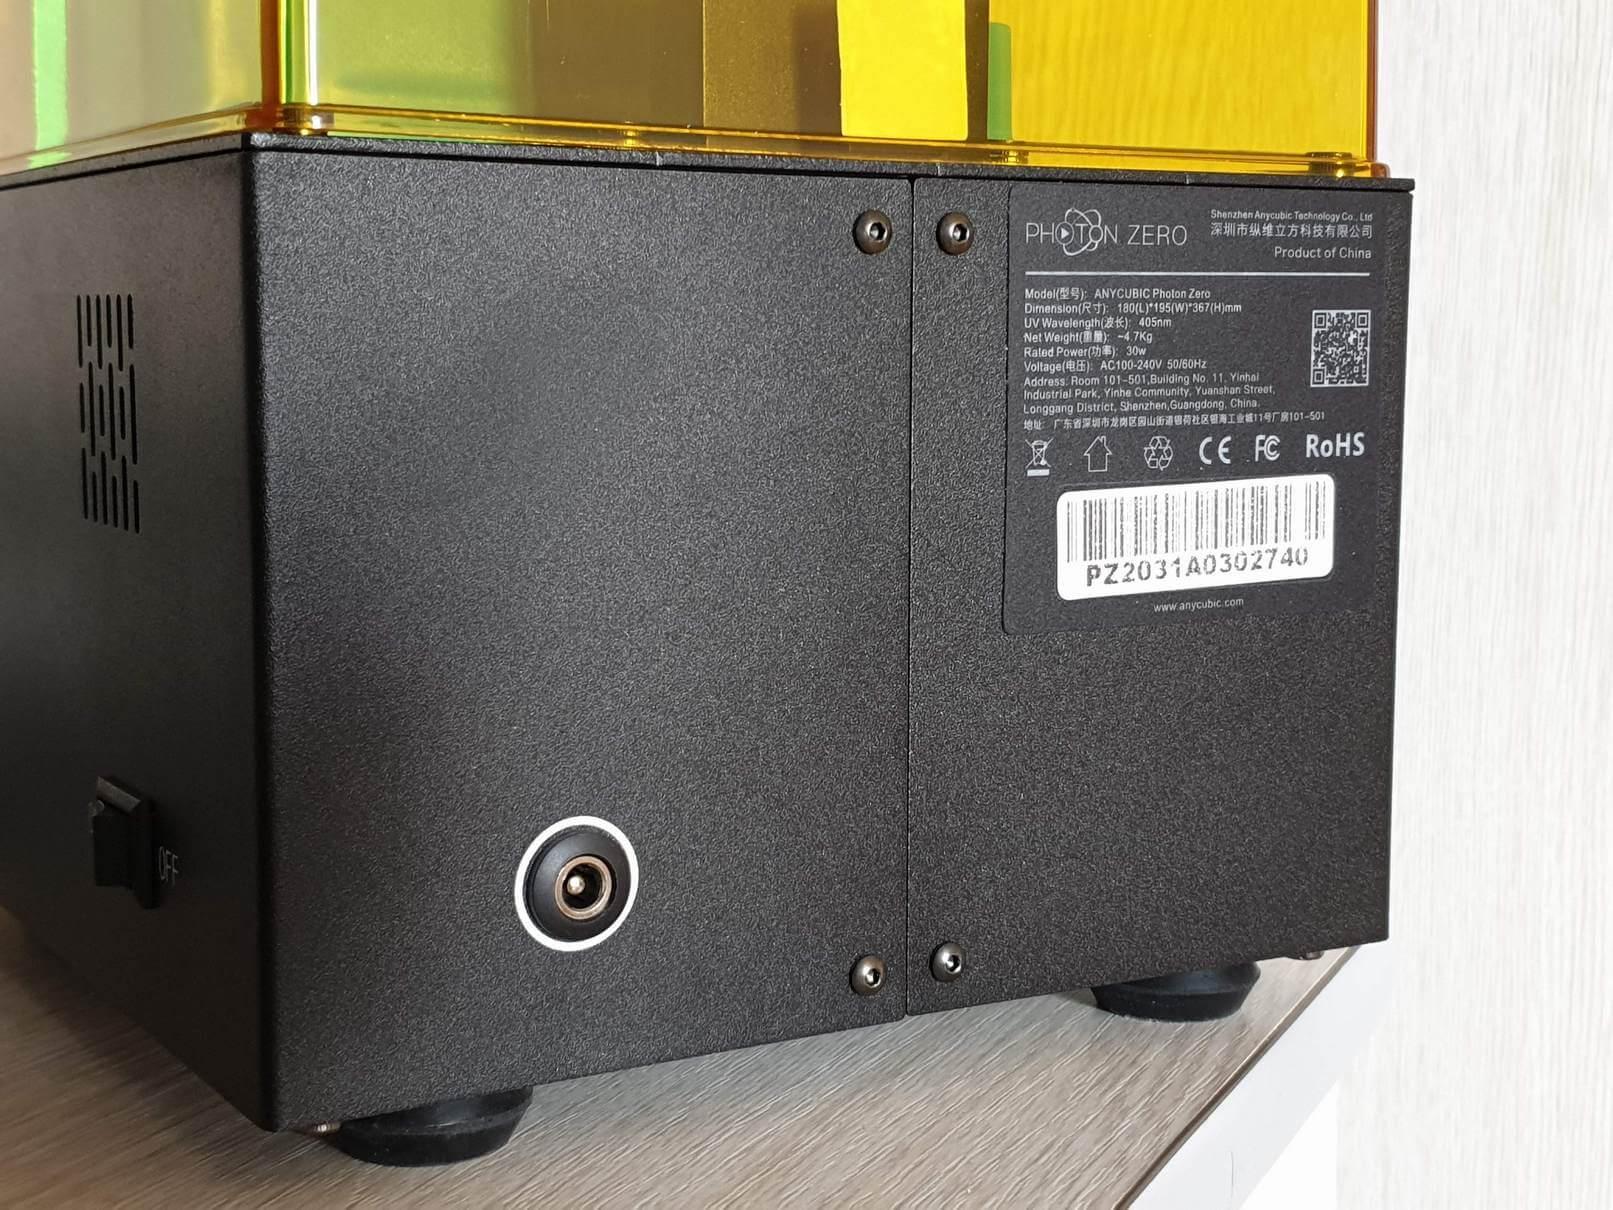 Anycubic Photon Zero Budget Resin Printer 4   Anycubic Photon Zero Review - Budget Resin Printer